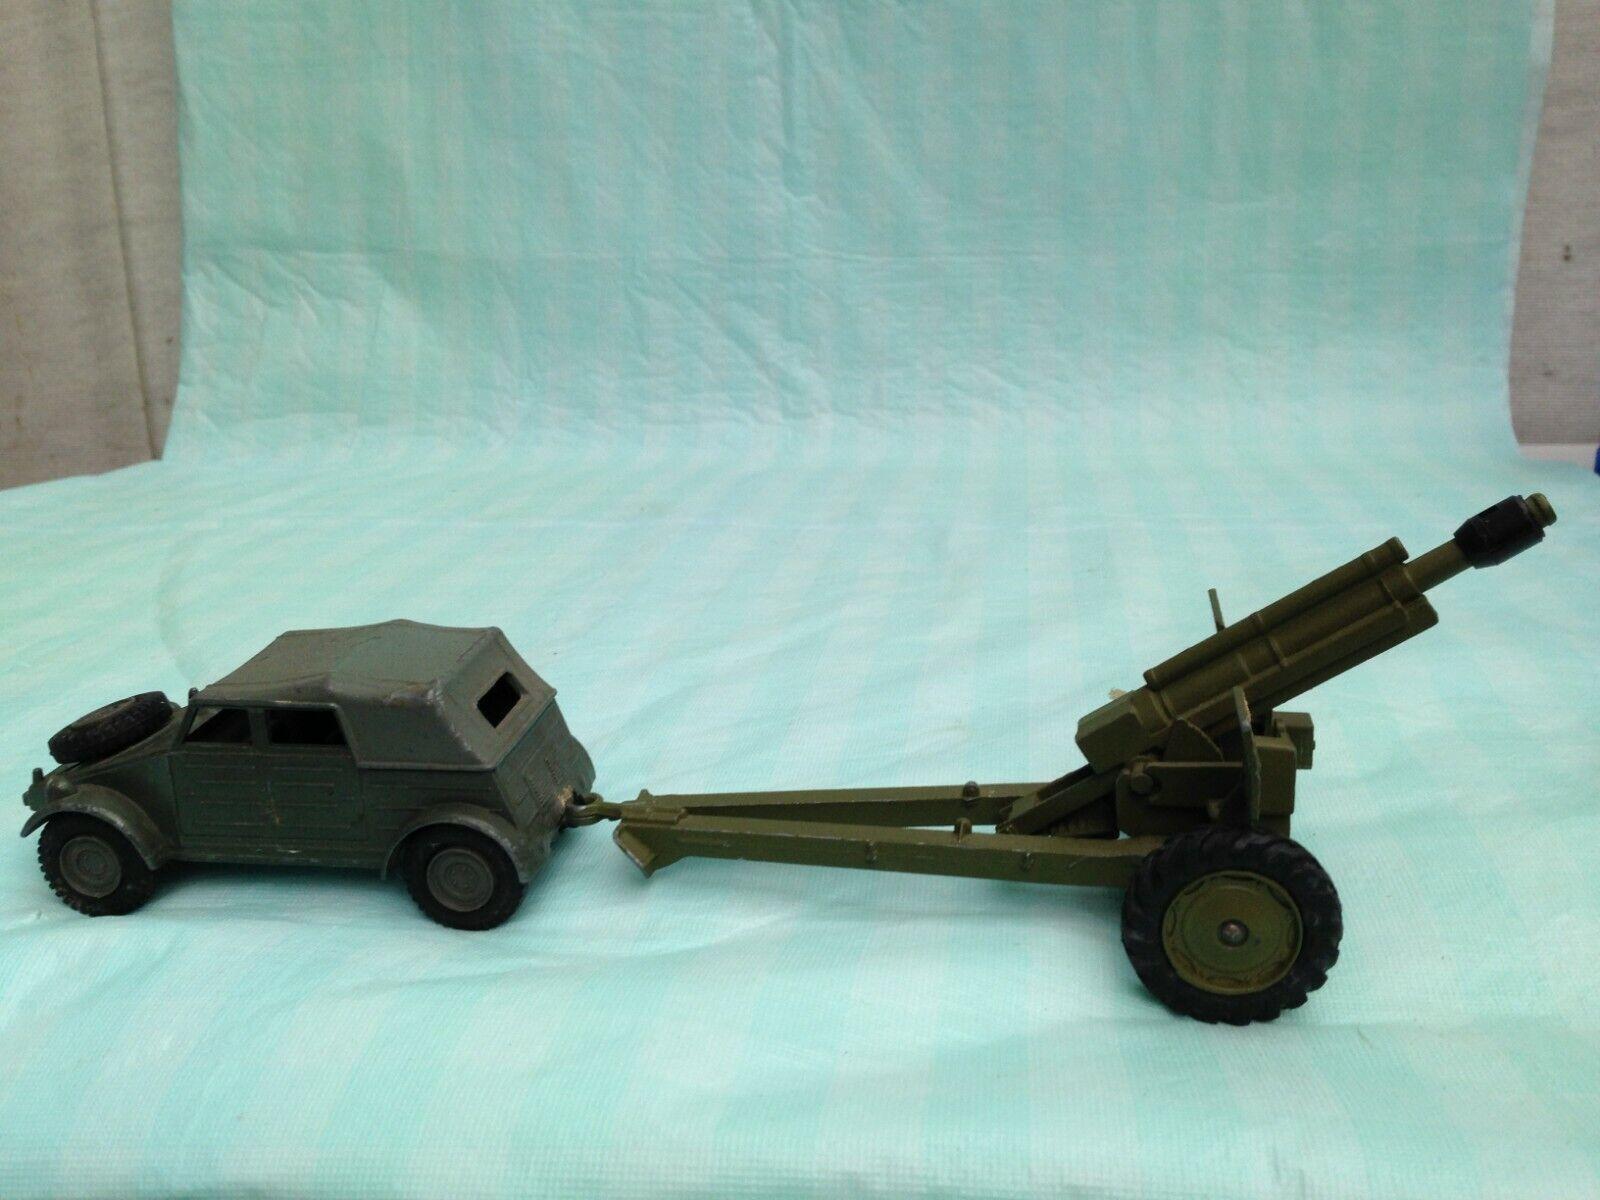 Vintage Dinky Military Volkswagen KDF & No 617 Anti Tank 50mm Gun